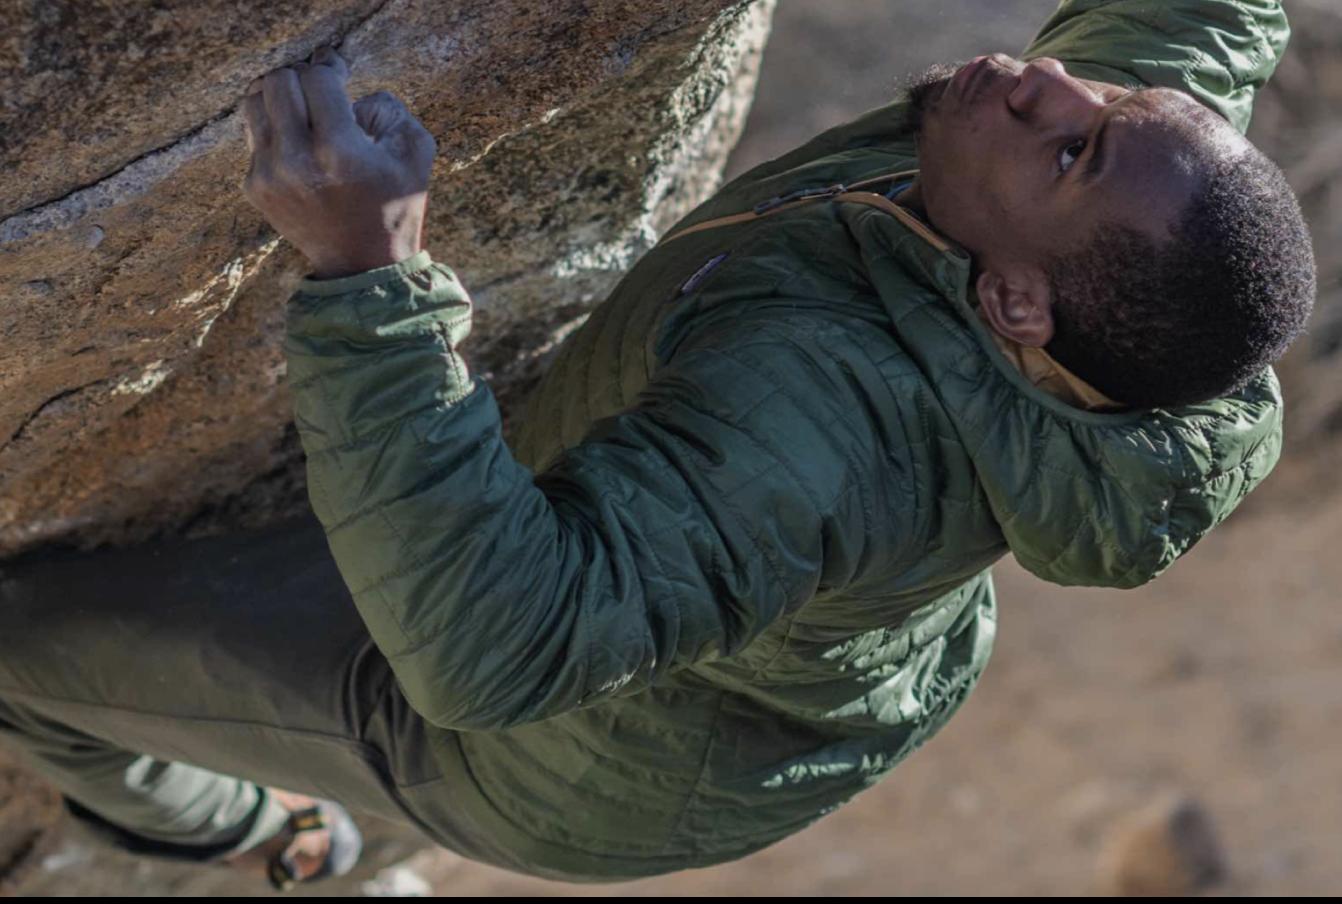 Man climbing a rock face